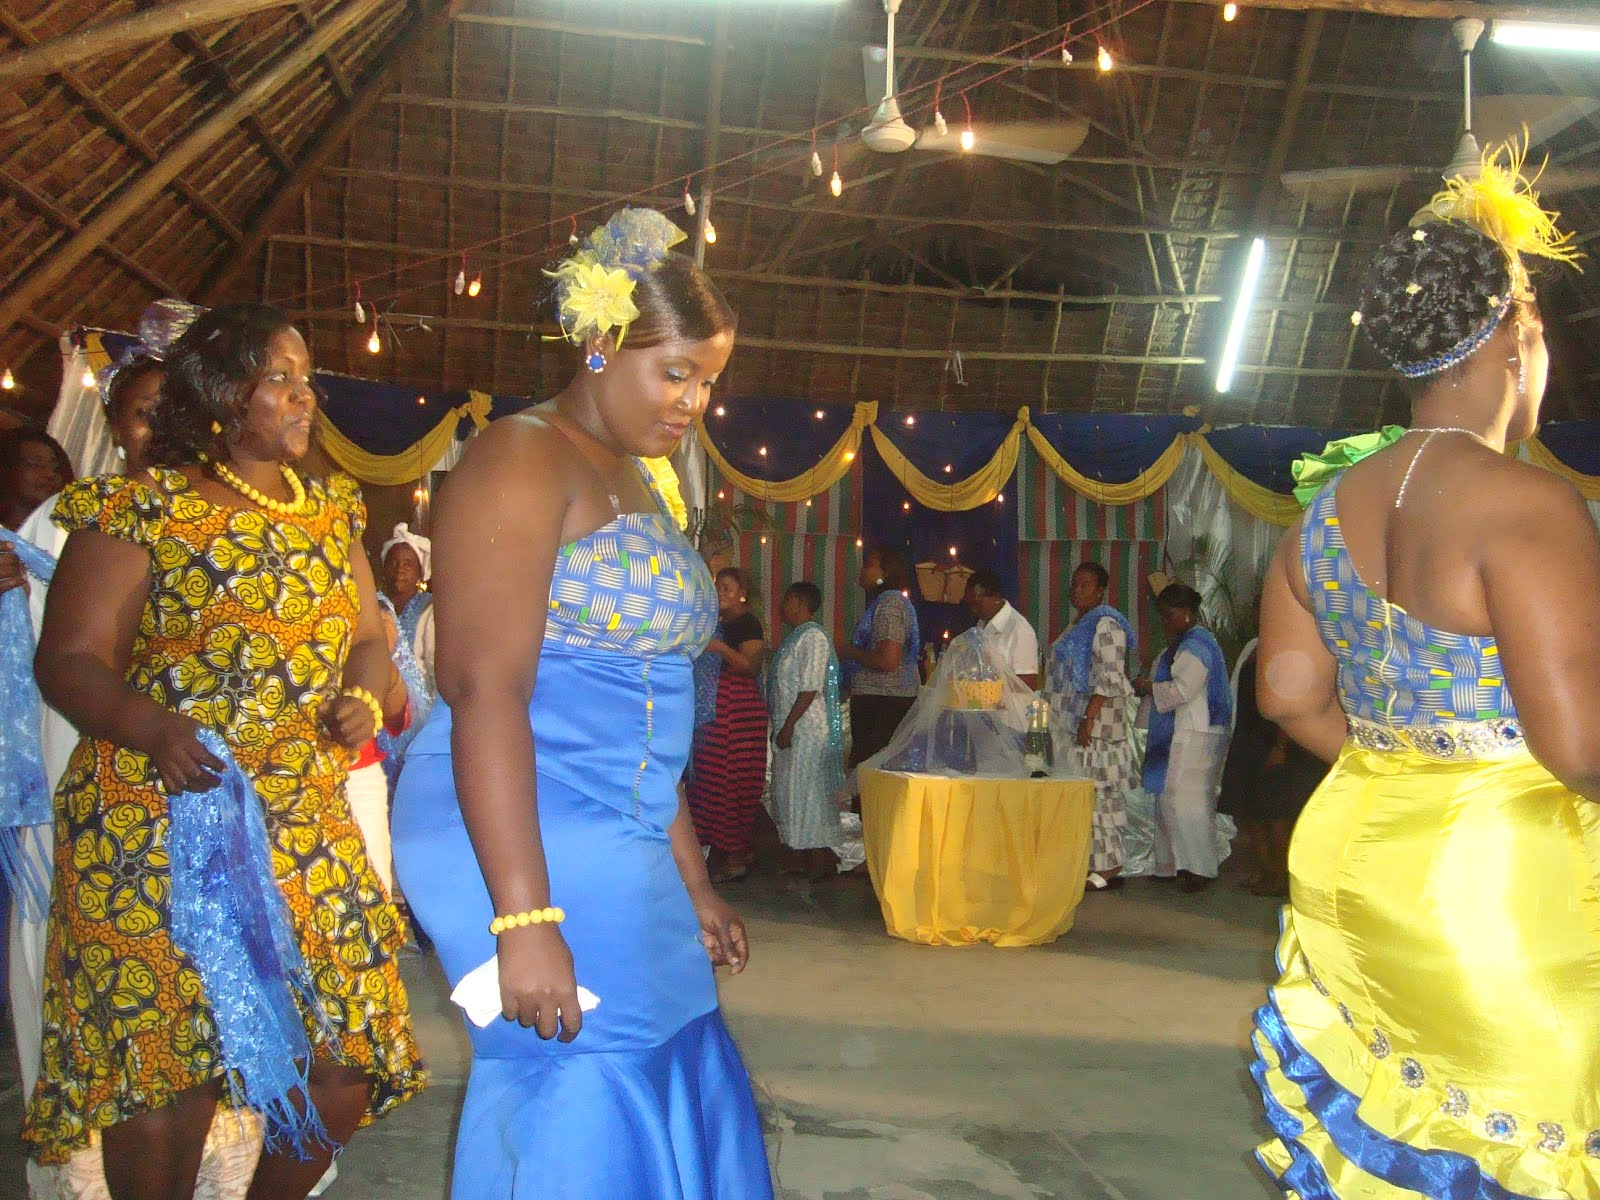 Tanzania wanawake uchi uchi holiday and vacation 3 bp blogspot com